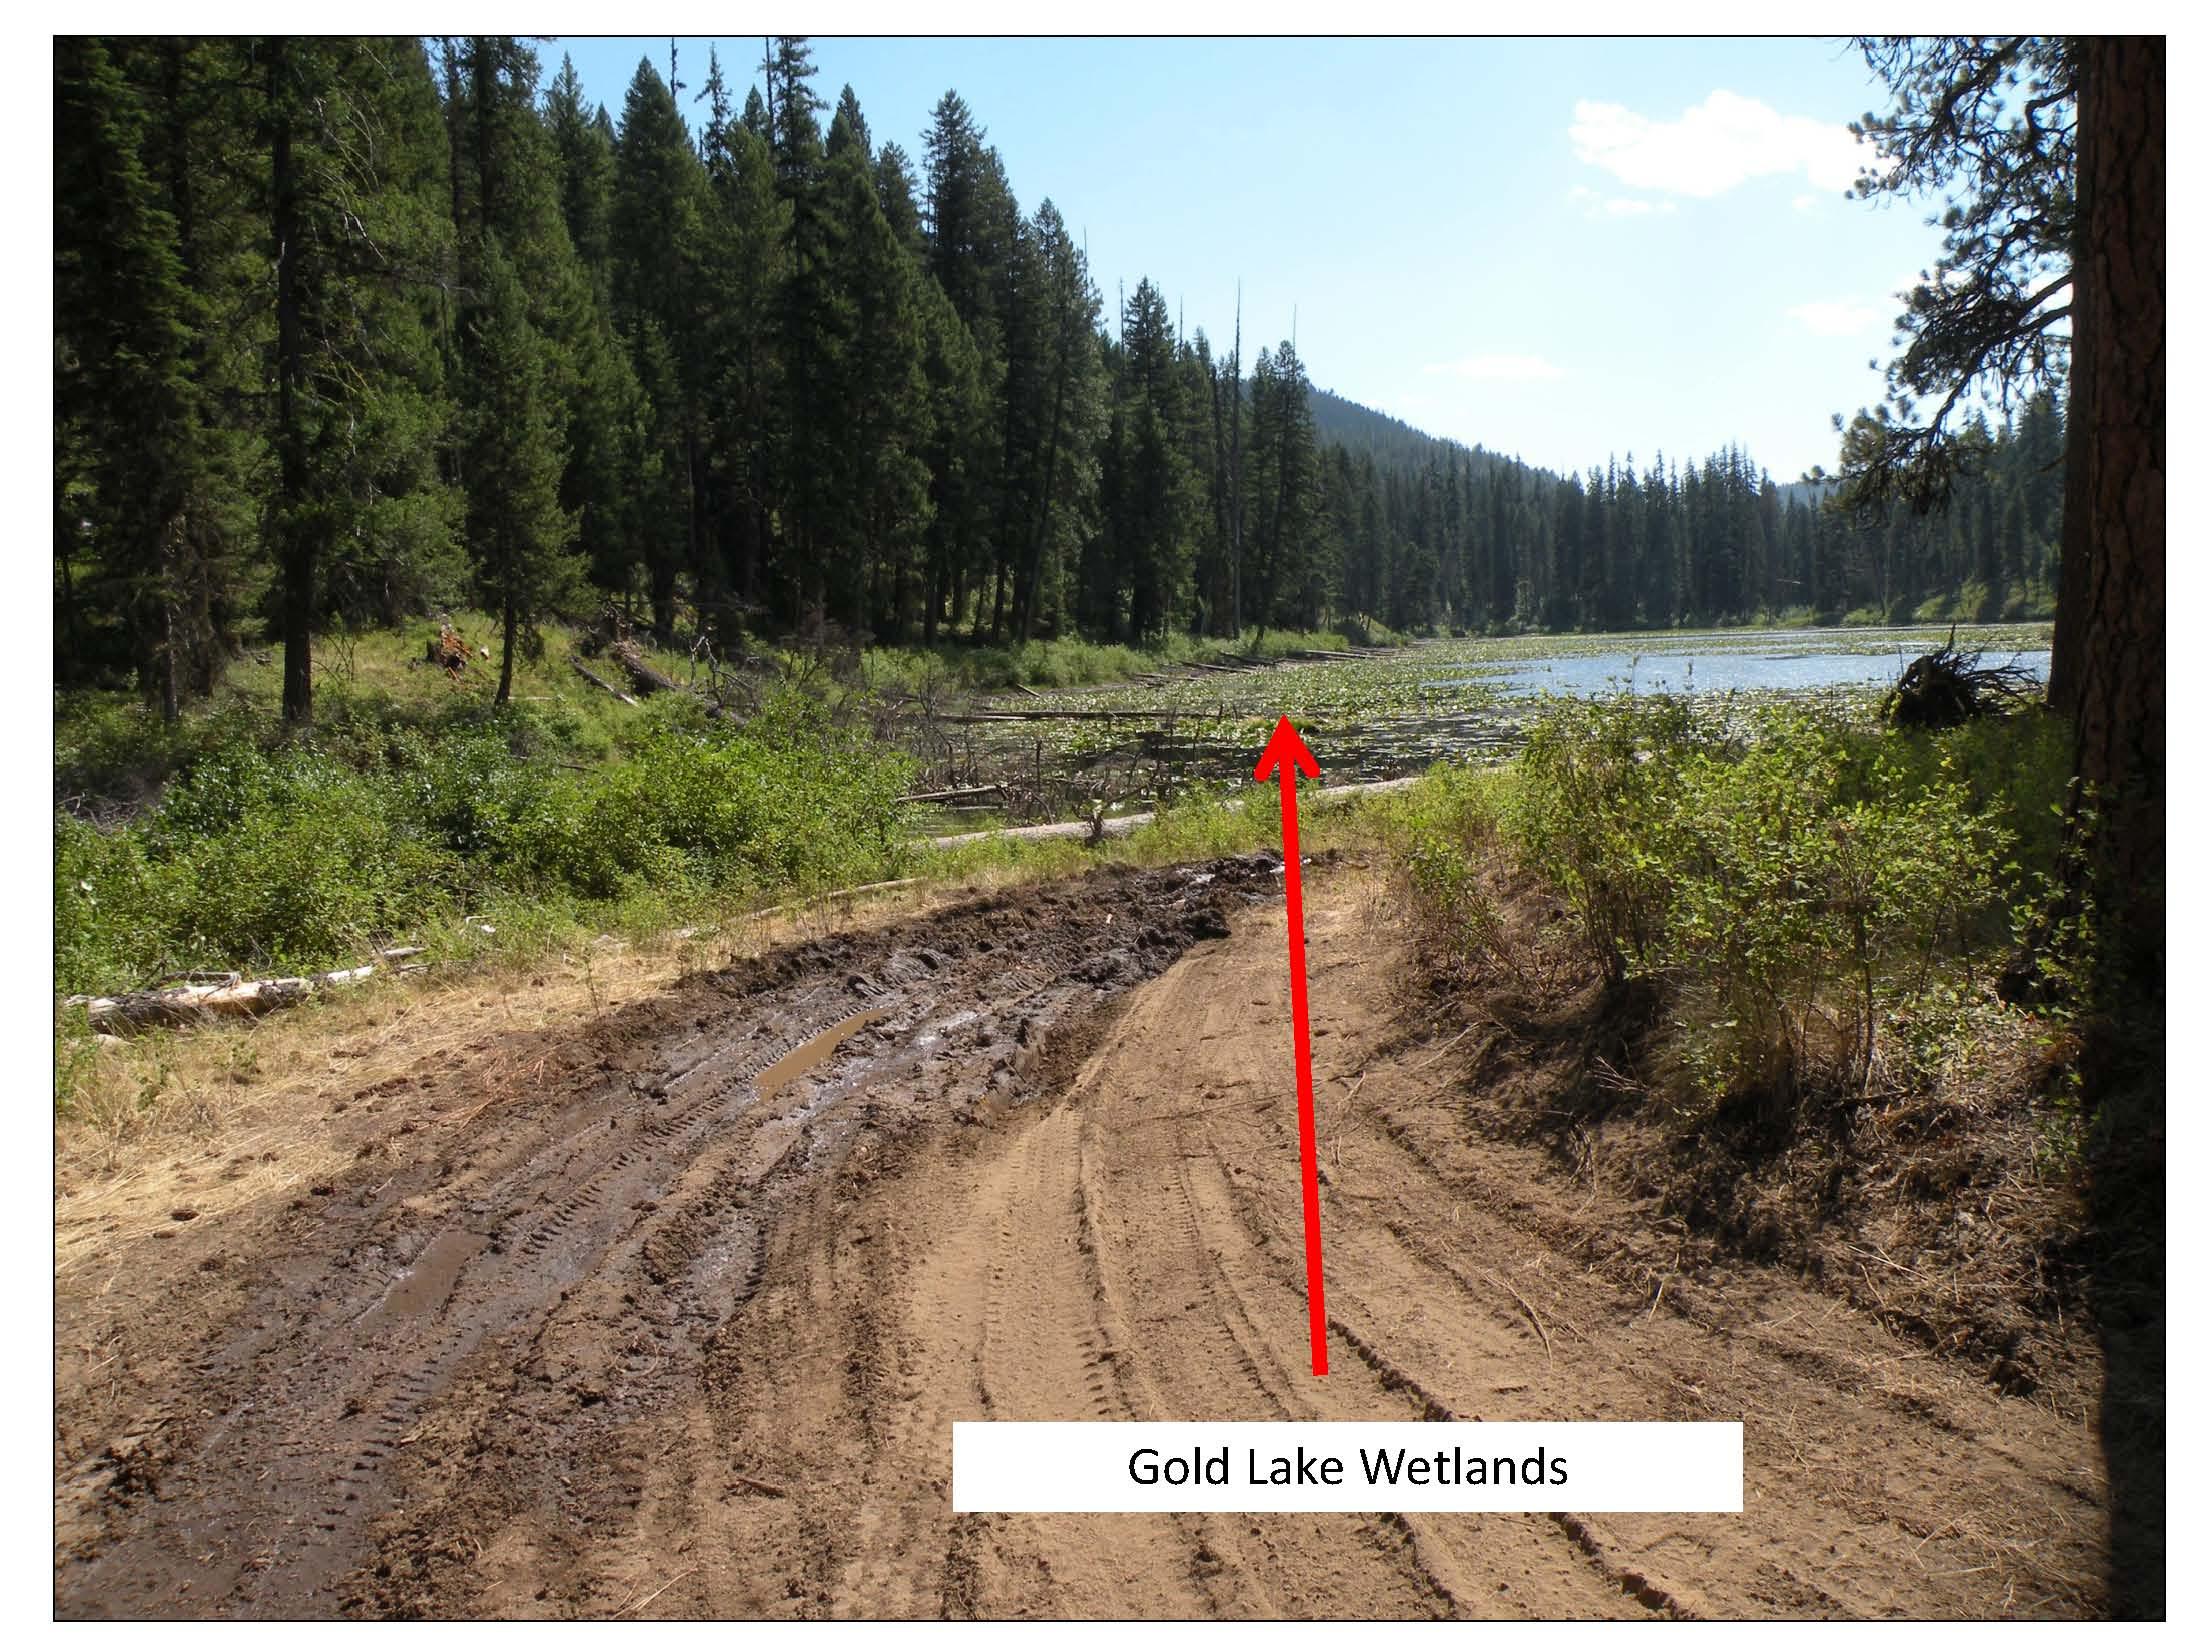 Drafting from Gold Lake Wetland_pics1_Page_1.jpg